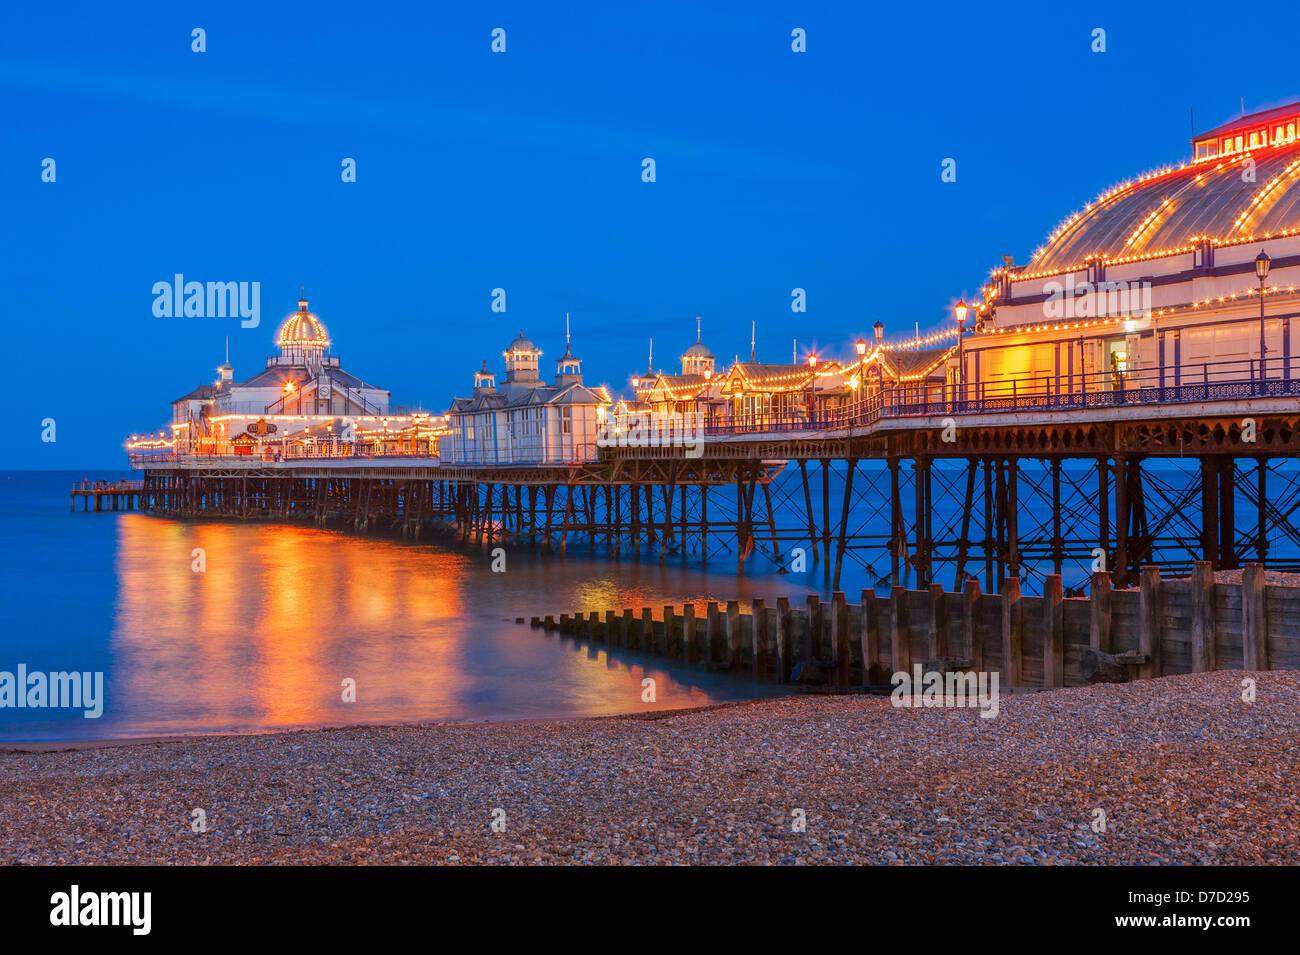 Eastbourne pier iluminada en penumbraFoto de stock